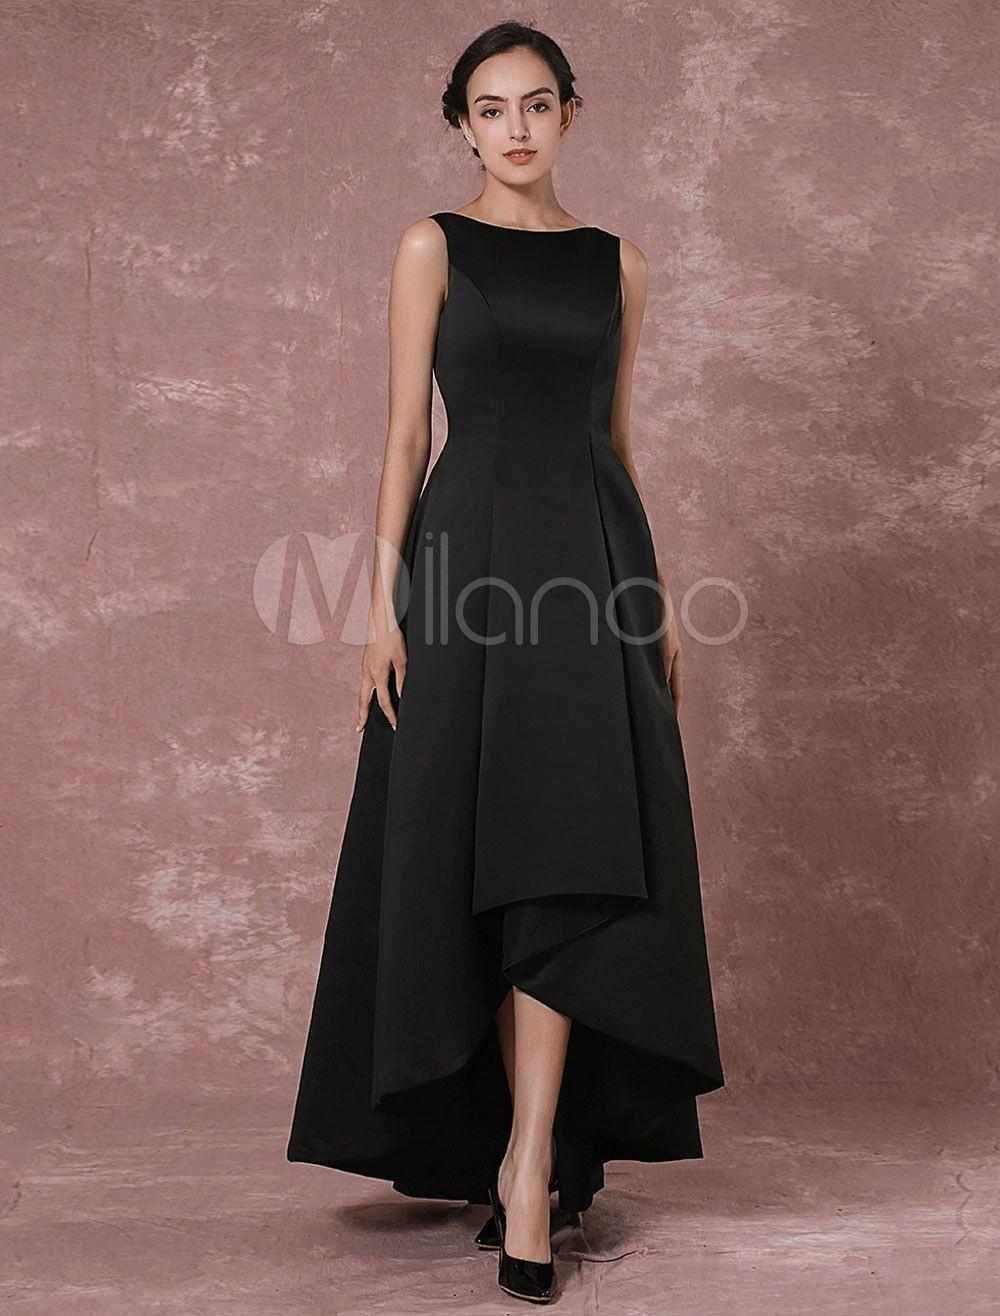 Formal Elegant Rückenfreie Abendkleider Stylish10 Erstaunlich Rückenfreie Abendkleider Boutique